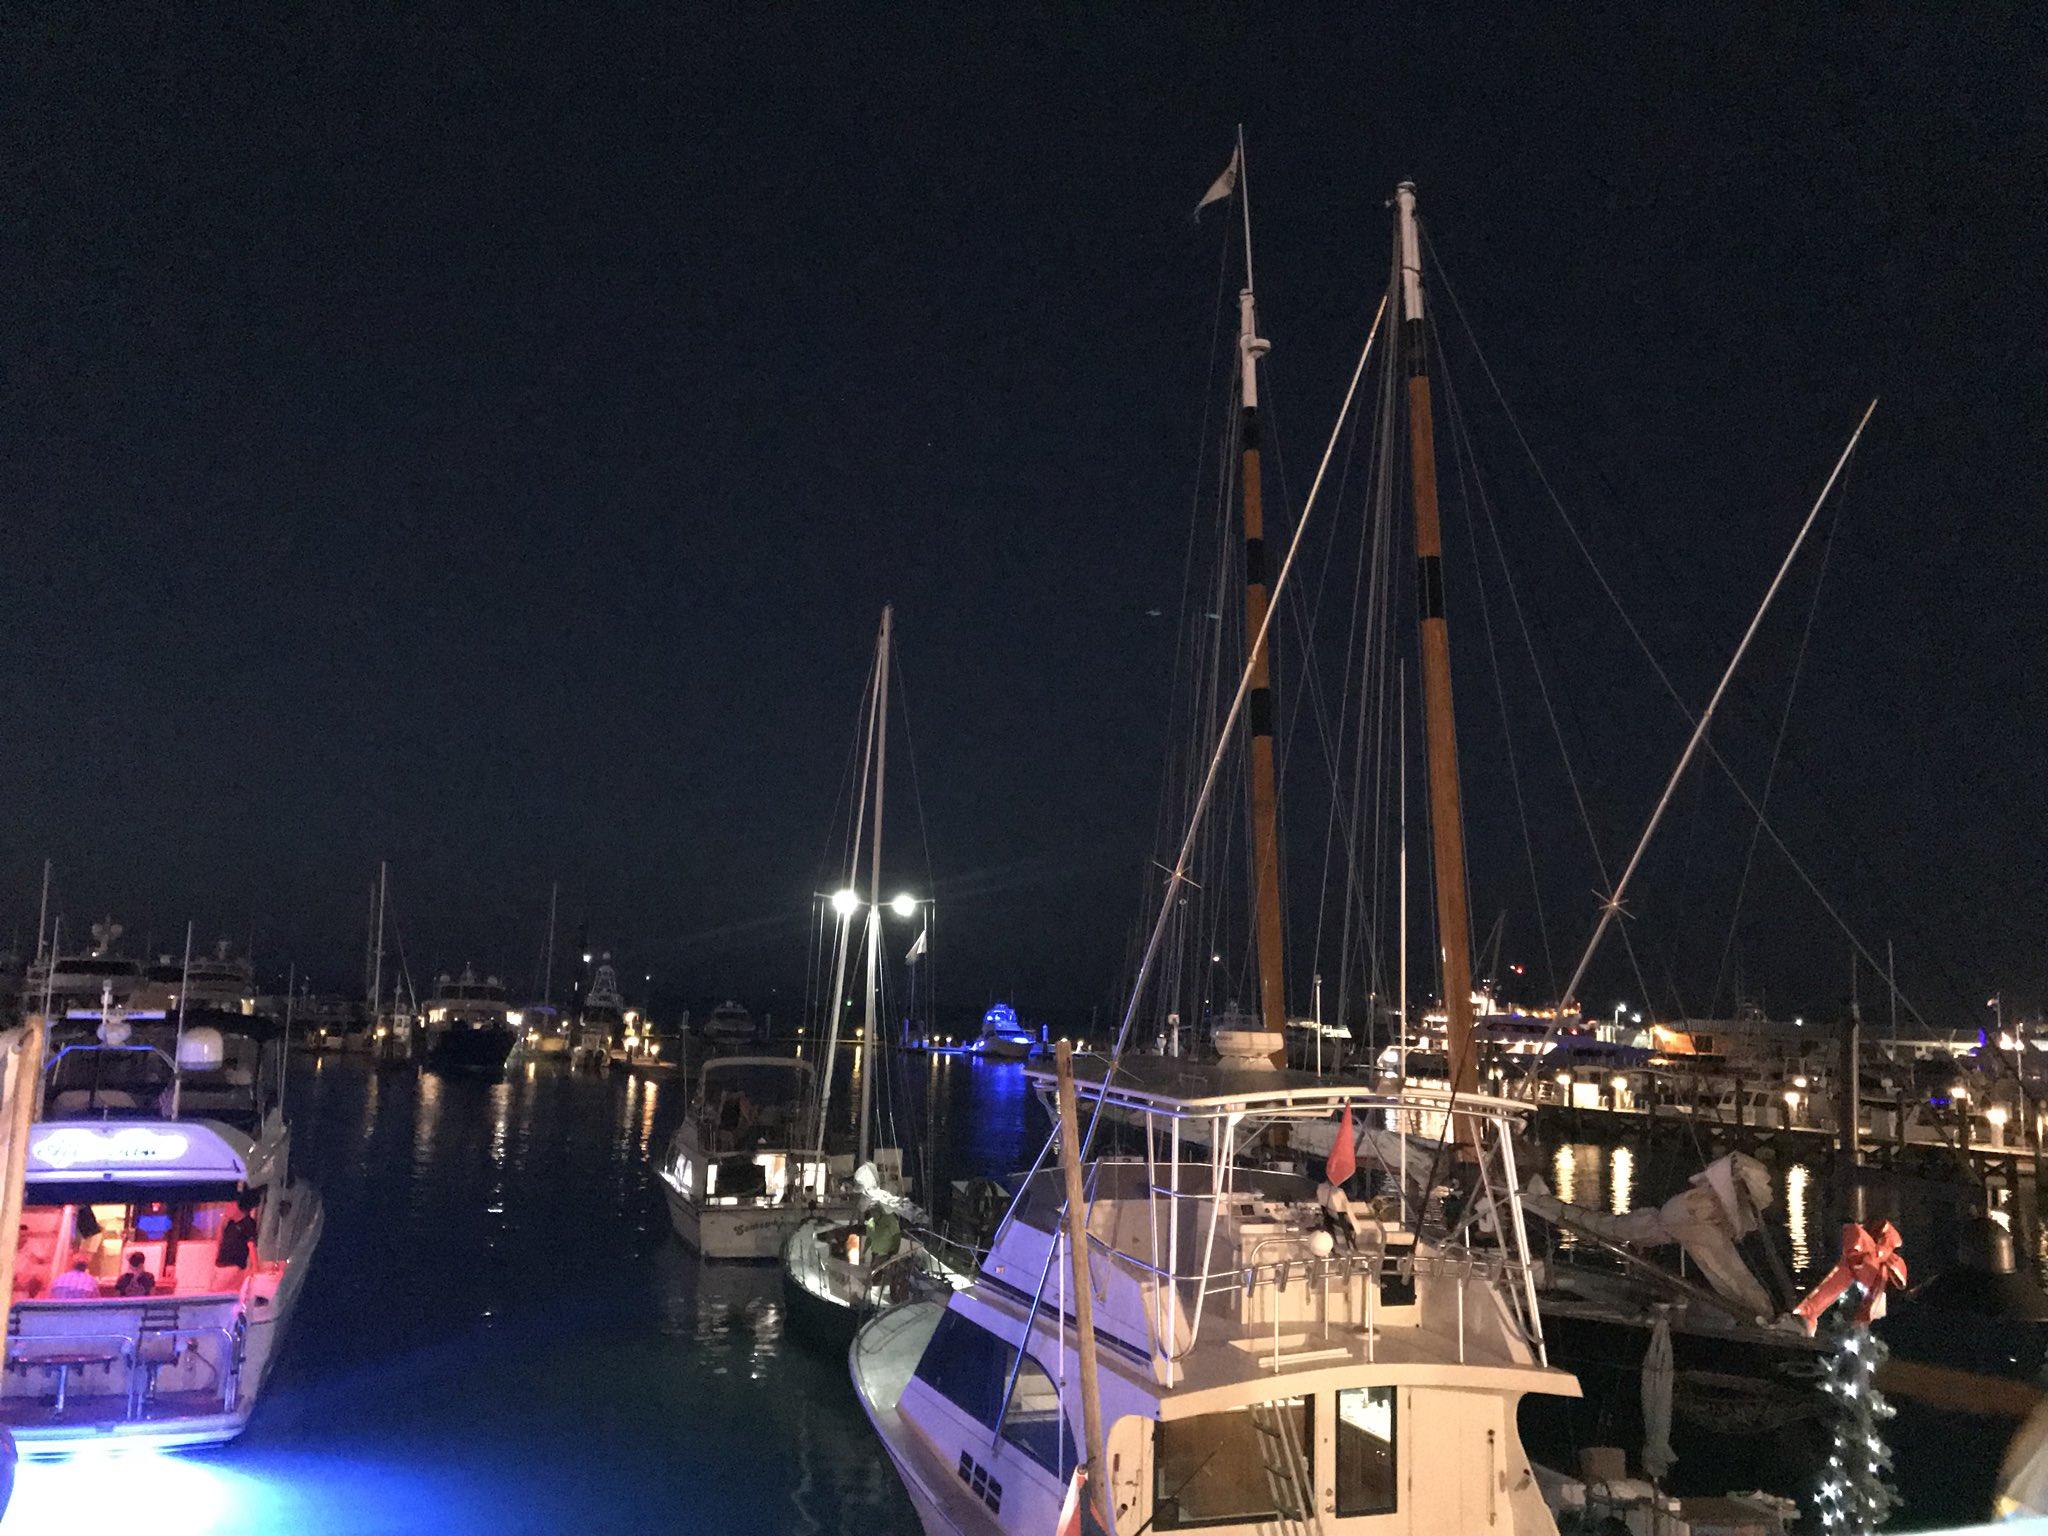 Portside Dinning ��#roamflorida #floridakeys #keywest #conchrepublic #schoonerwharfbar �� https://t.co/u4H1OJ4WJC